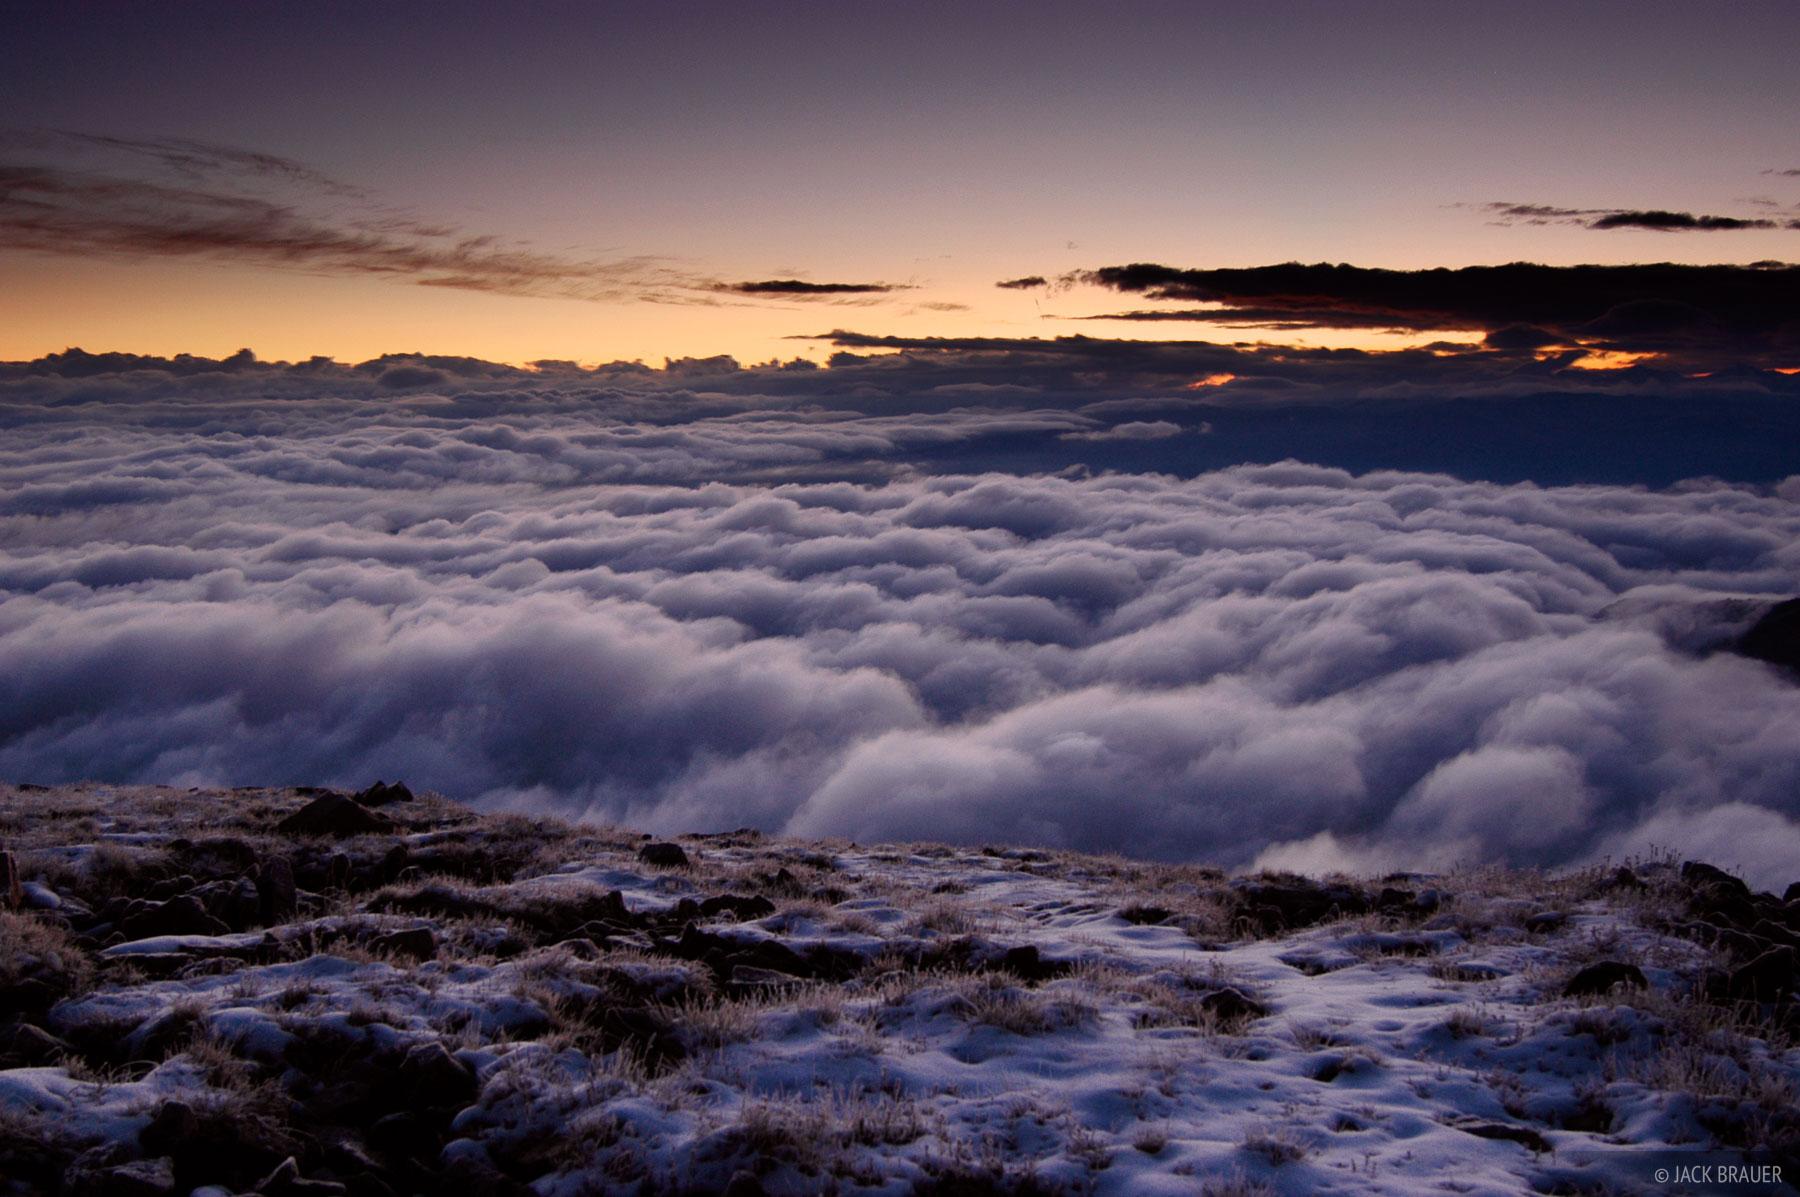 Notch Mountain, Holy Cross Wilderness, Sawatch Range, Colorado, photo